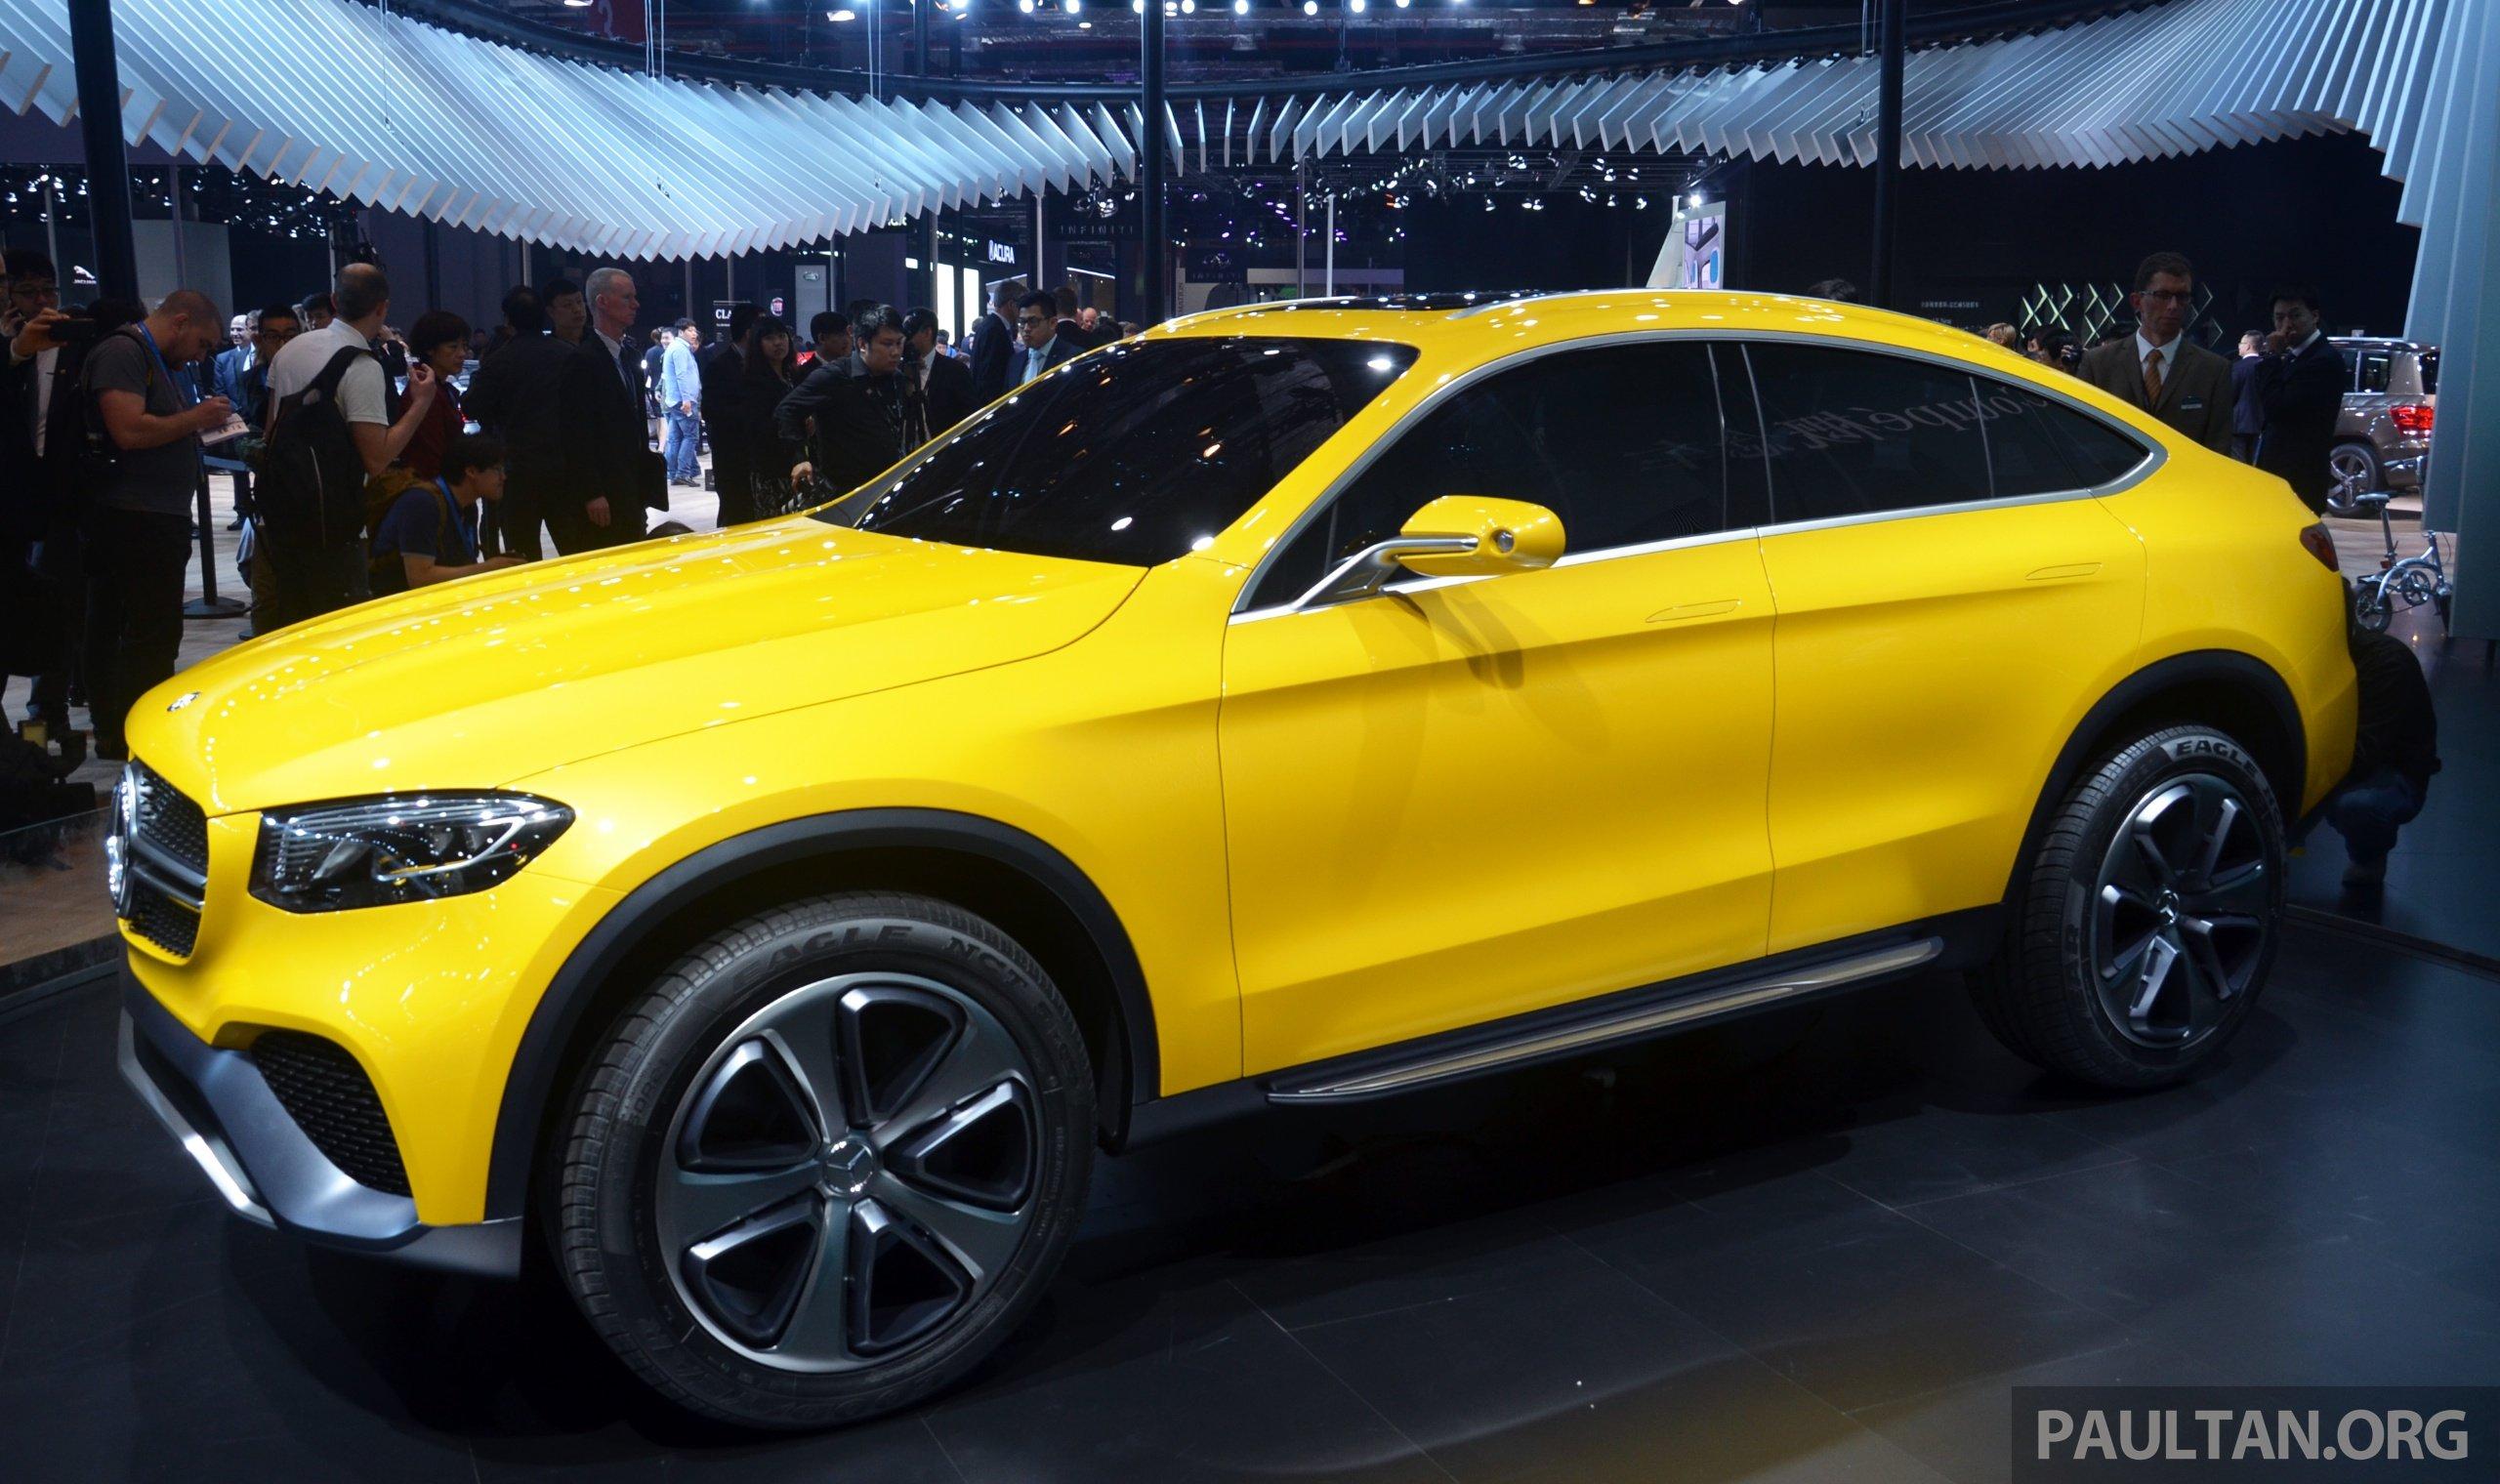 https://s3.paultan.org/image/2015/04/mercedes-benz-glc-coupe-concept-shanghai-1211.jpg